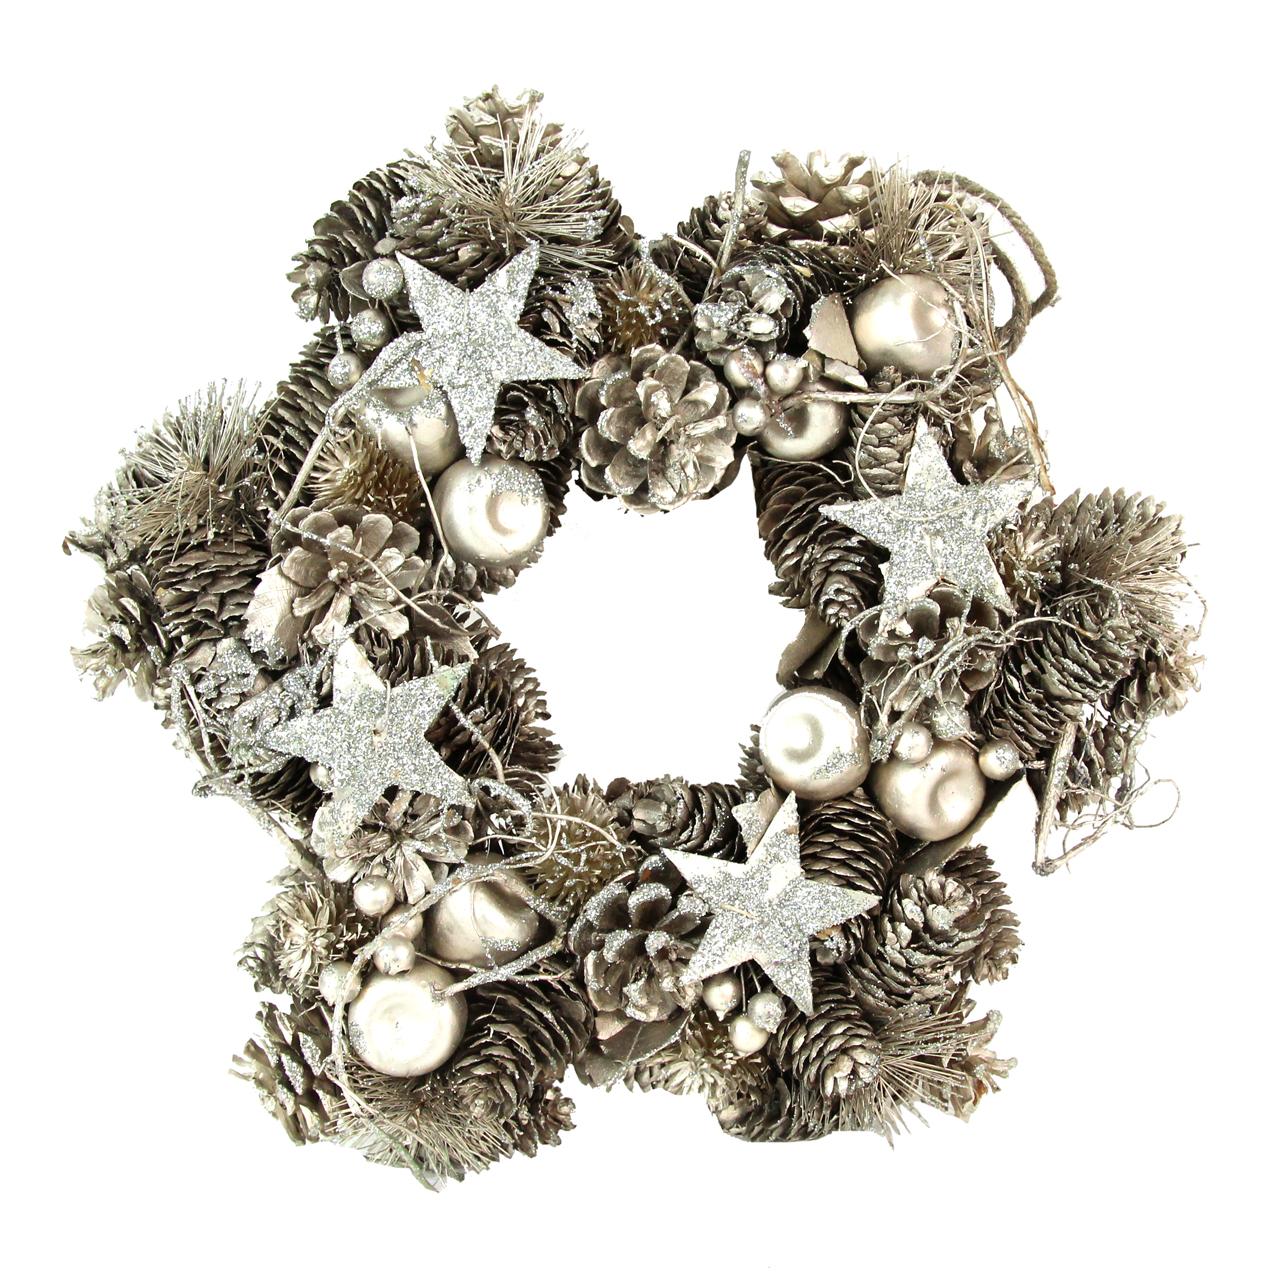 Coronita Decorativa Din Conuri De Brad Argintii 34 Cm